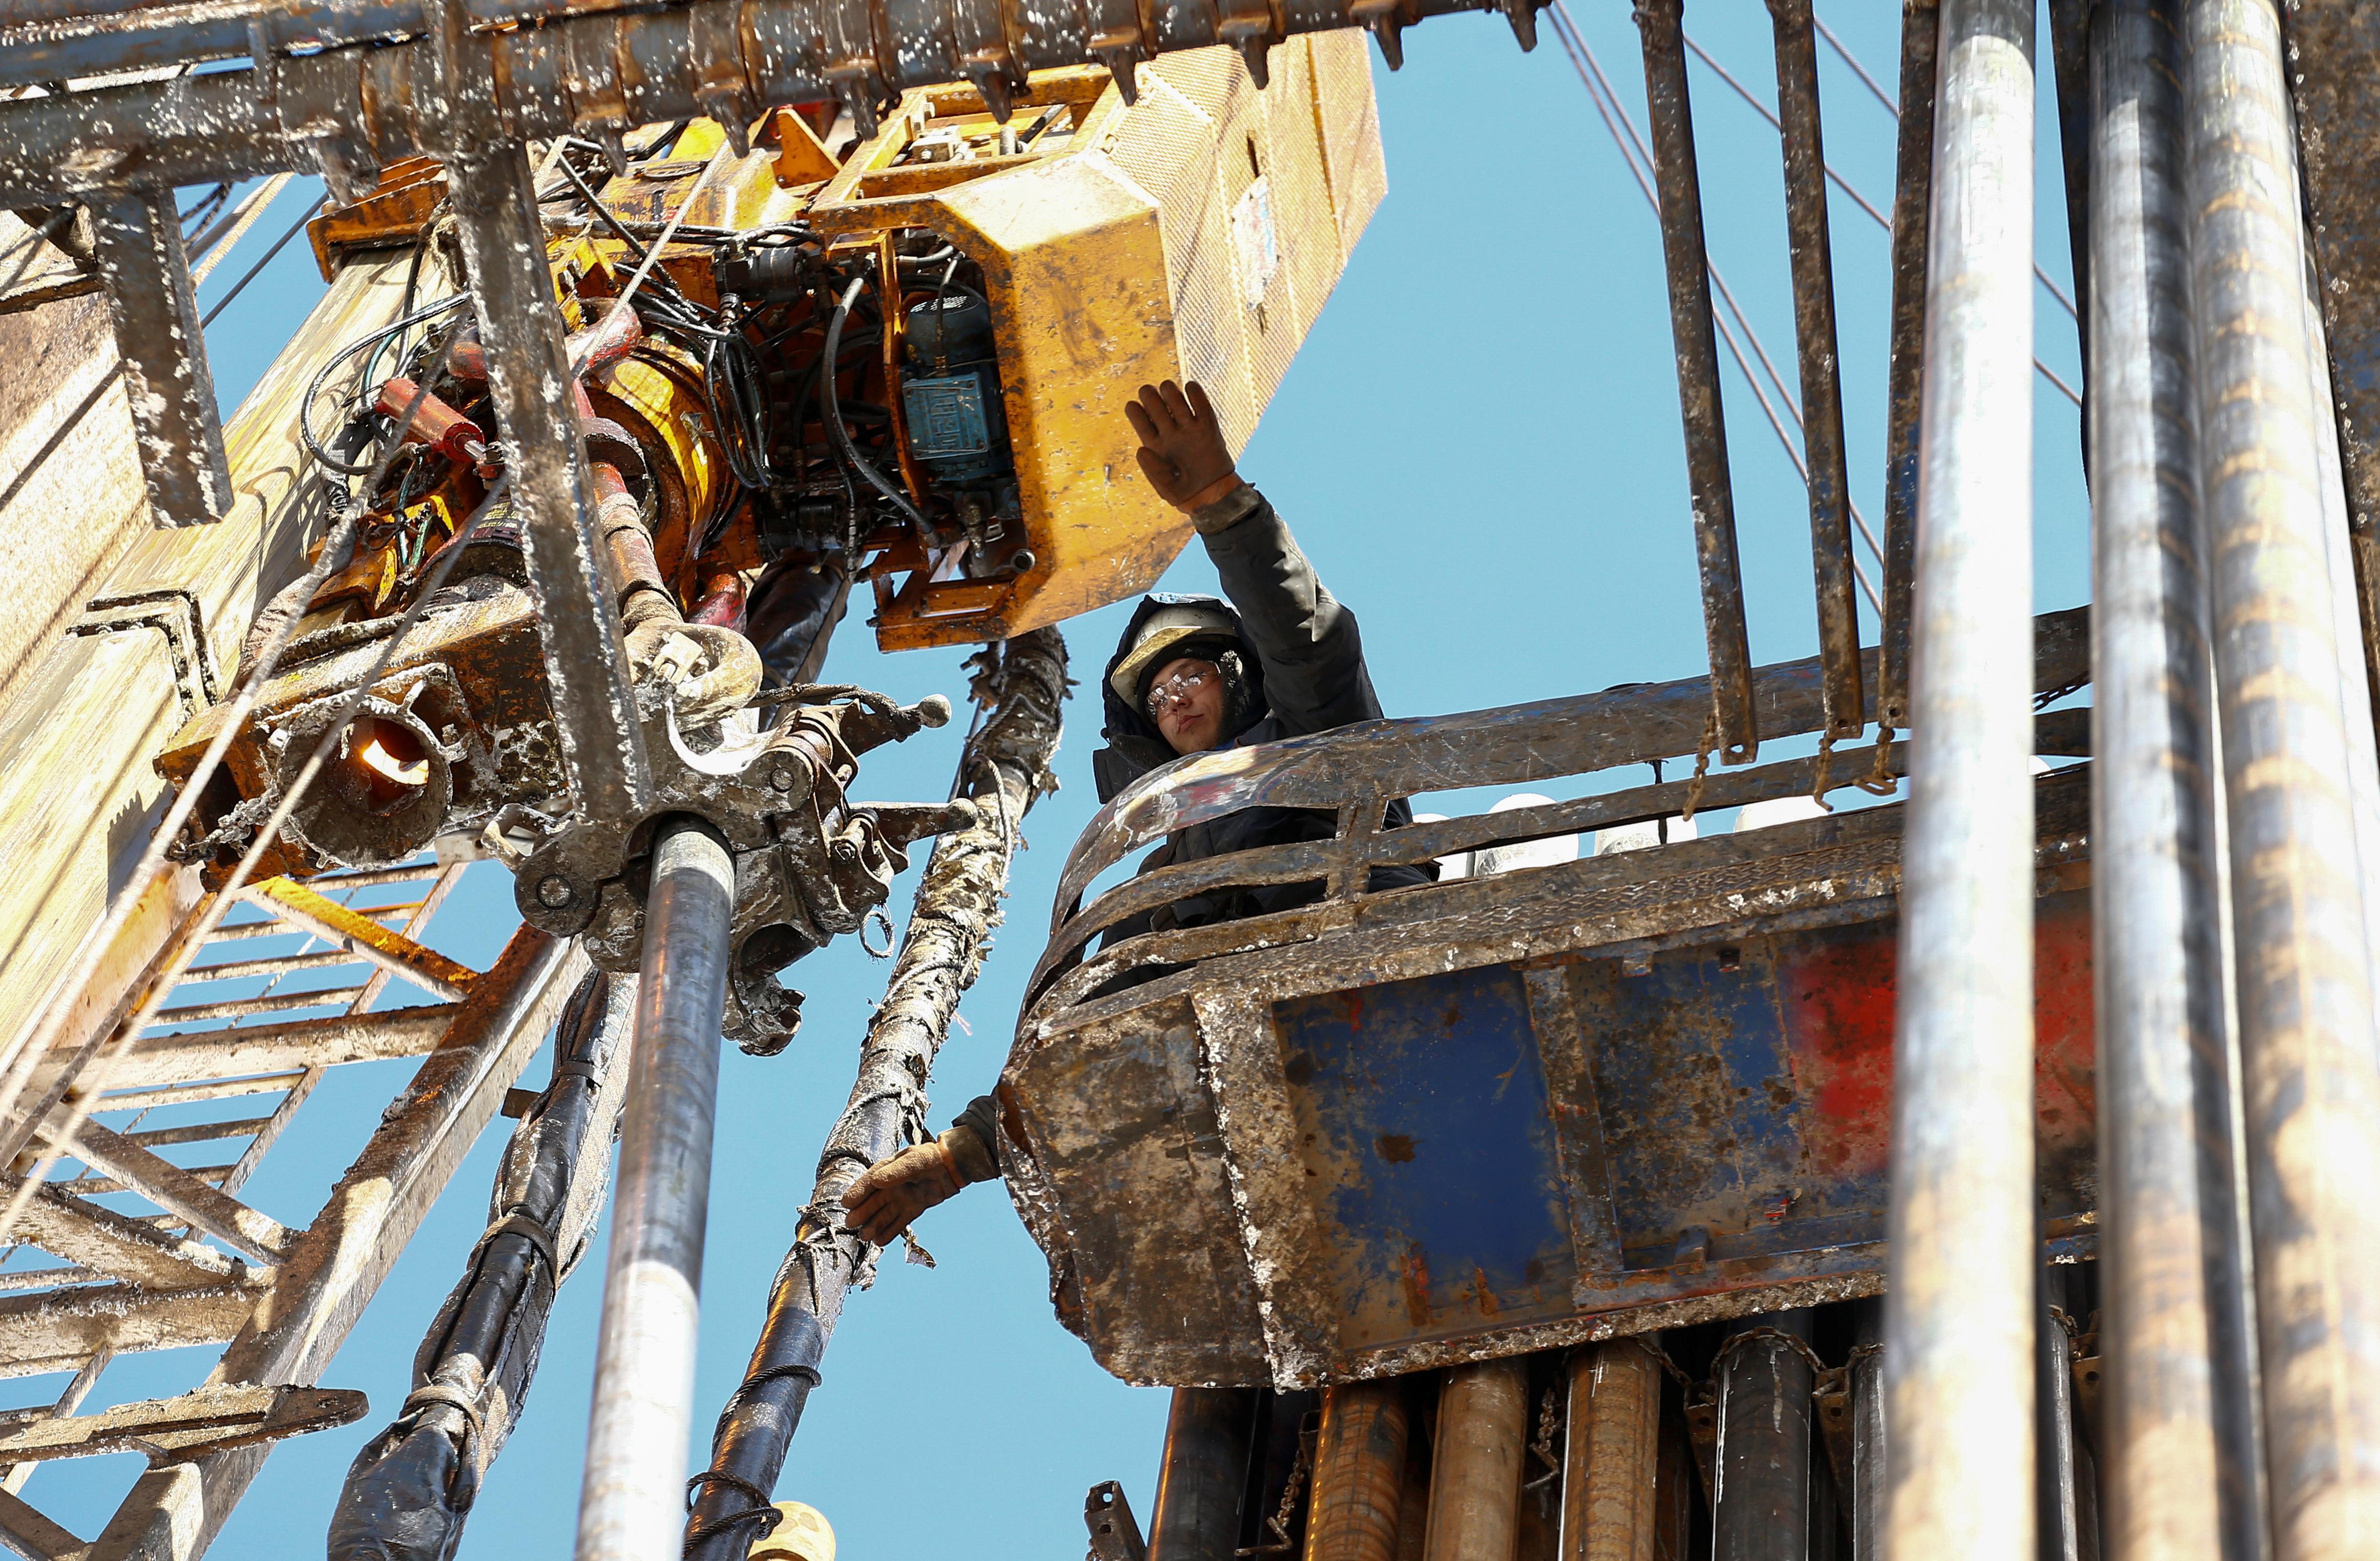 Column: Global oil consumption stagnates leaving prices under pressure